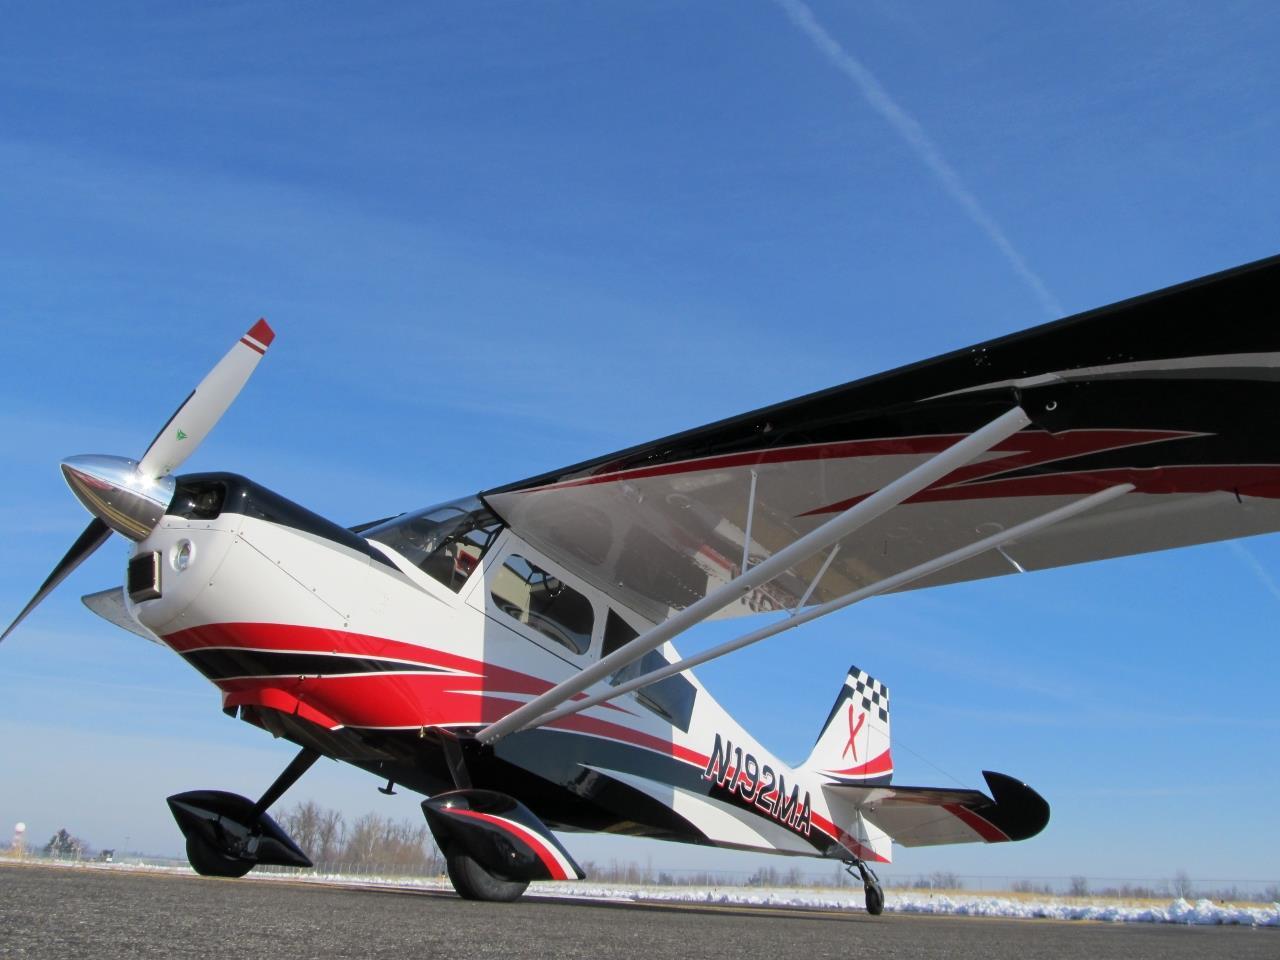 Pilot Rc Decathlon 180 Quot Pilot Rc Kits And Parts Desert Aircraft Australia